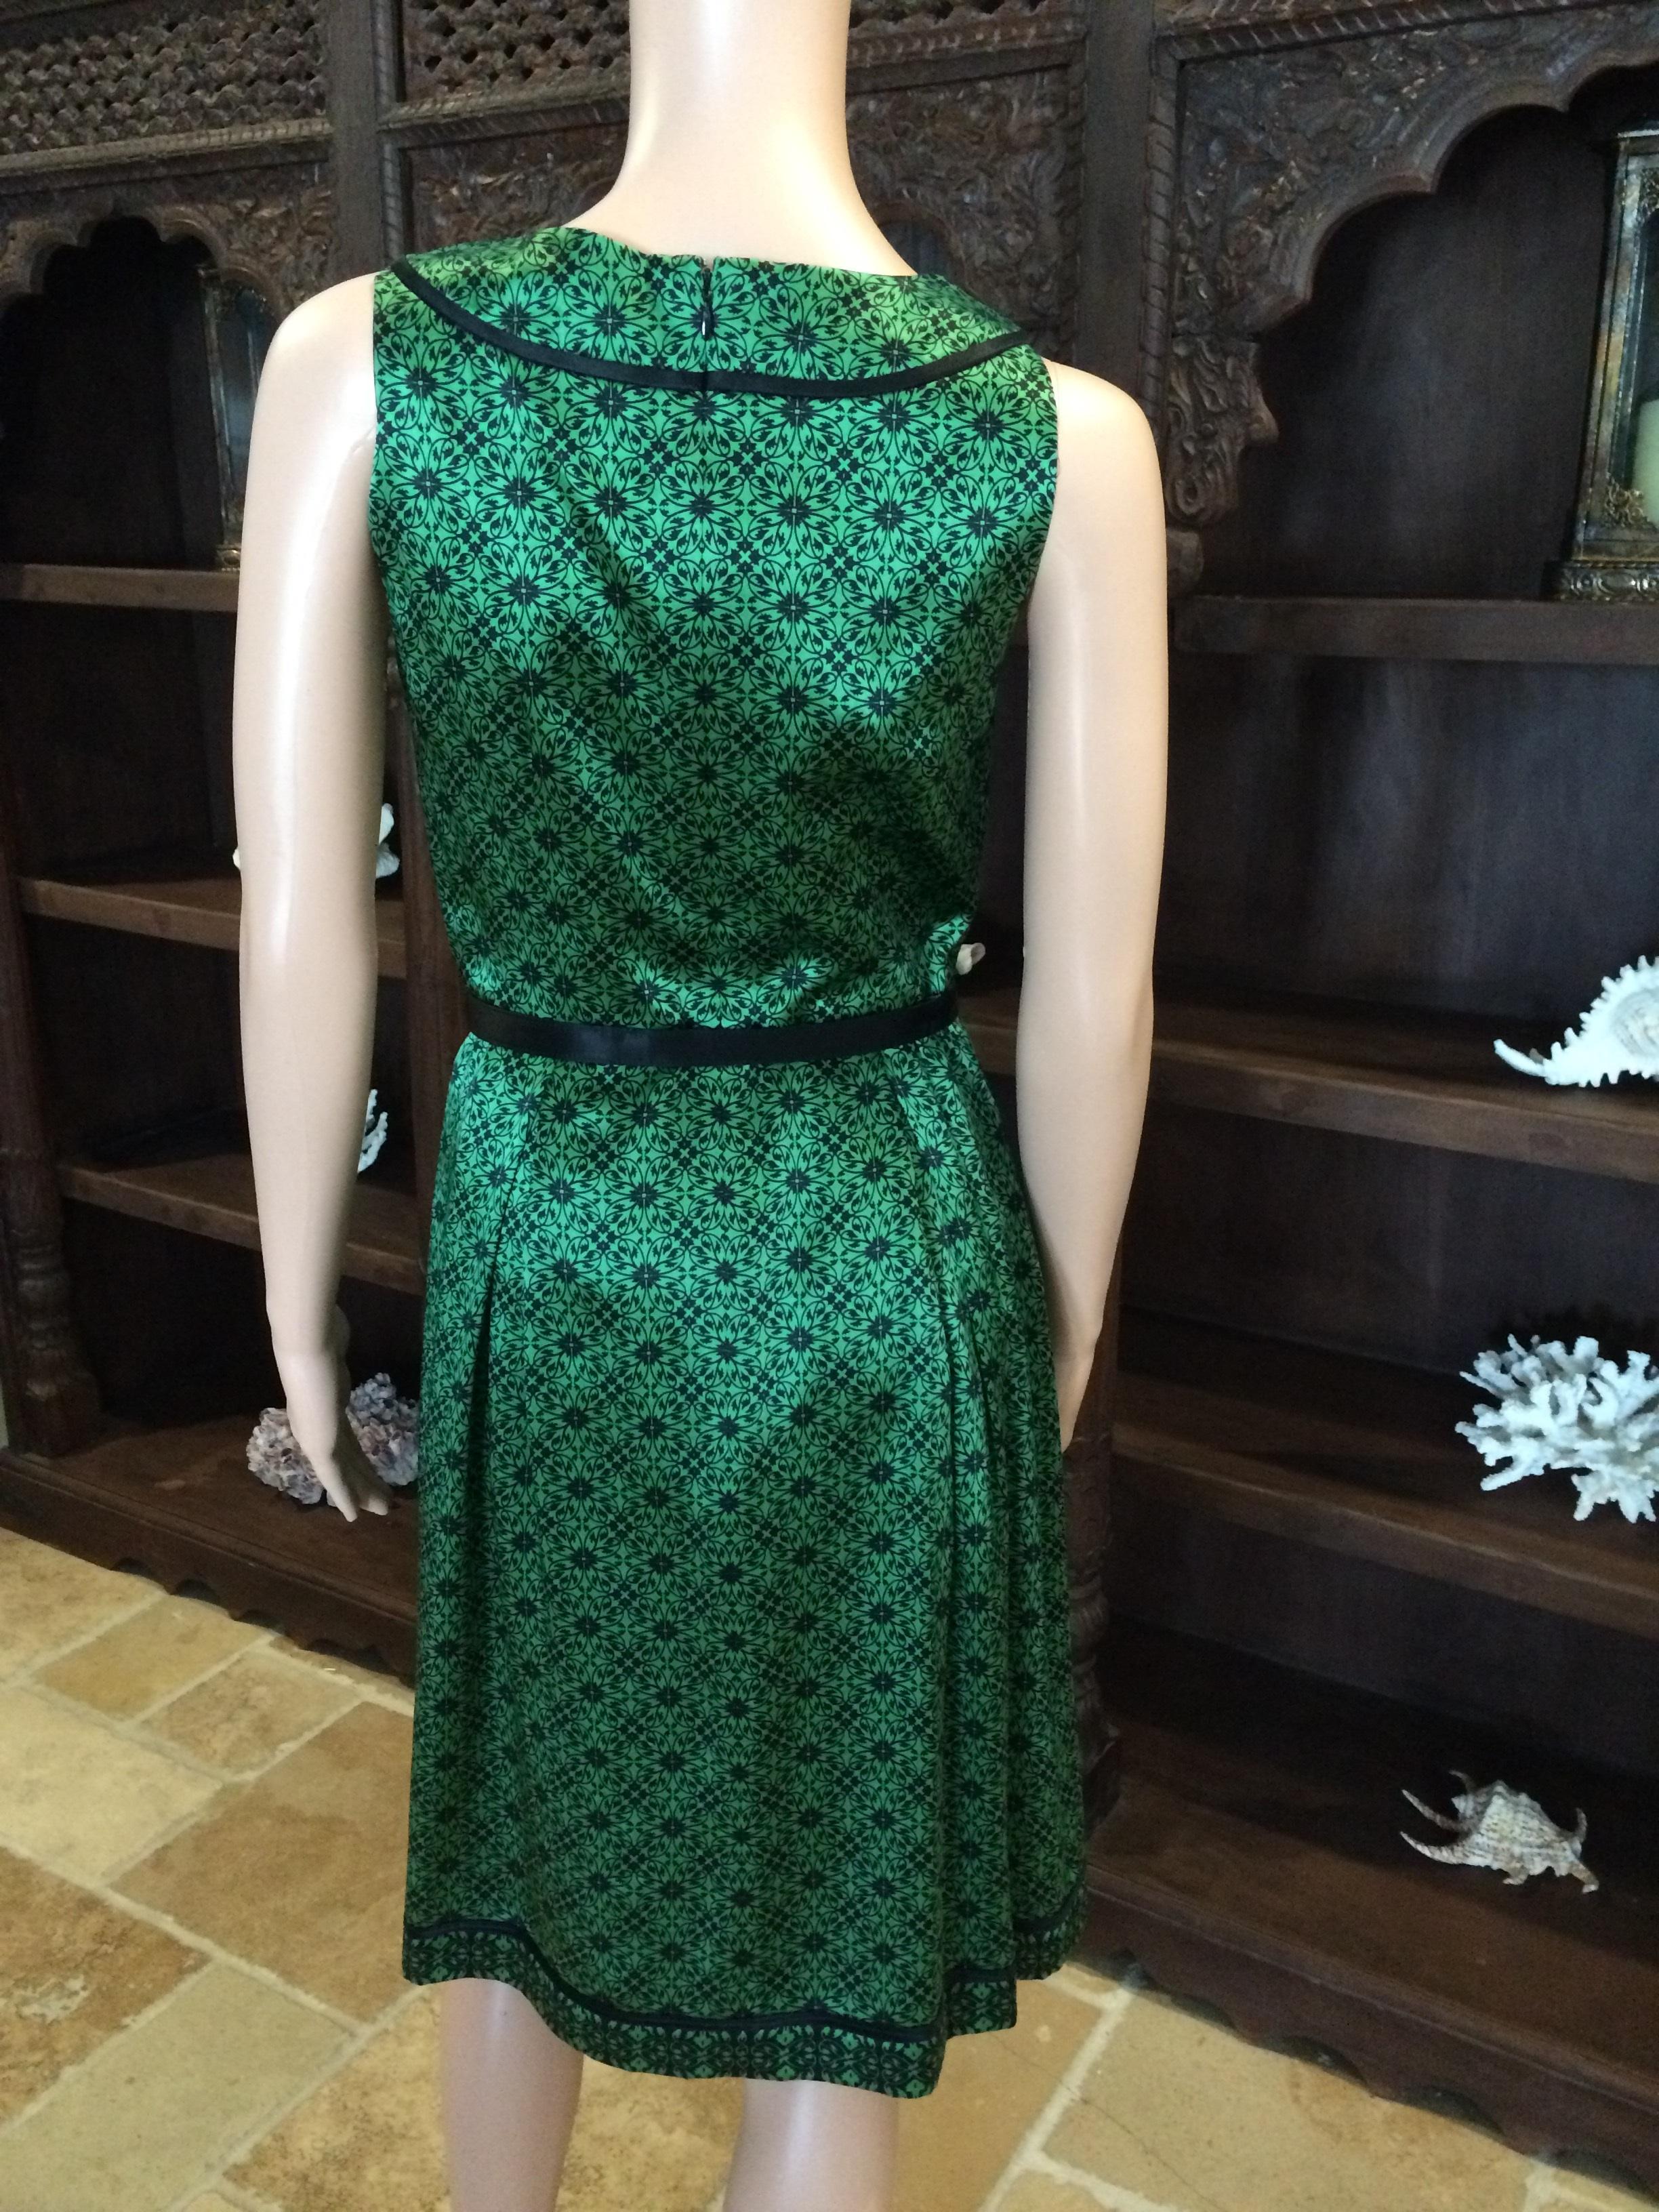 2806be32073 26024 B5SSD Stunning Emerald Green   Black Dress By Antonio Melani Size 2